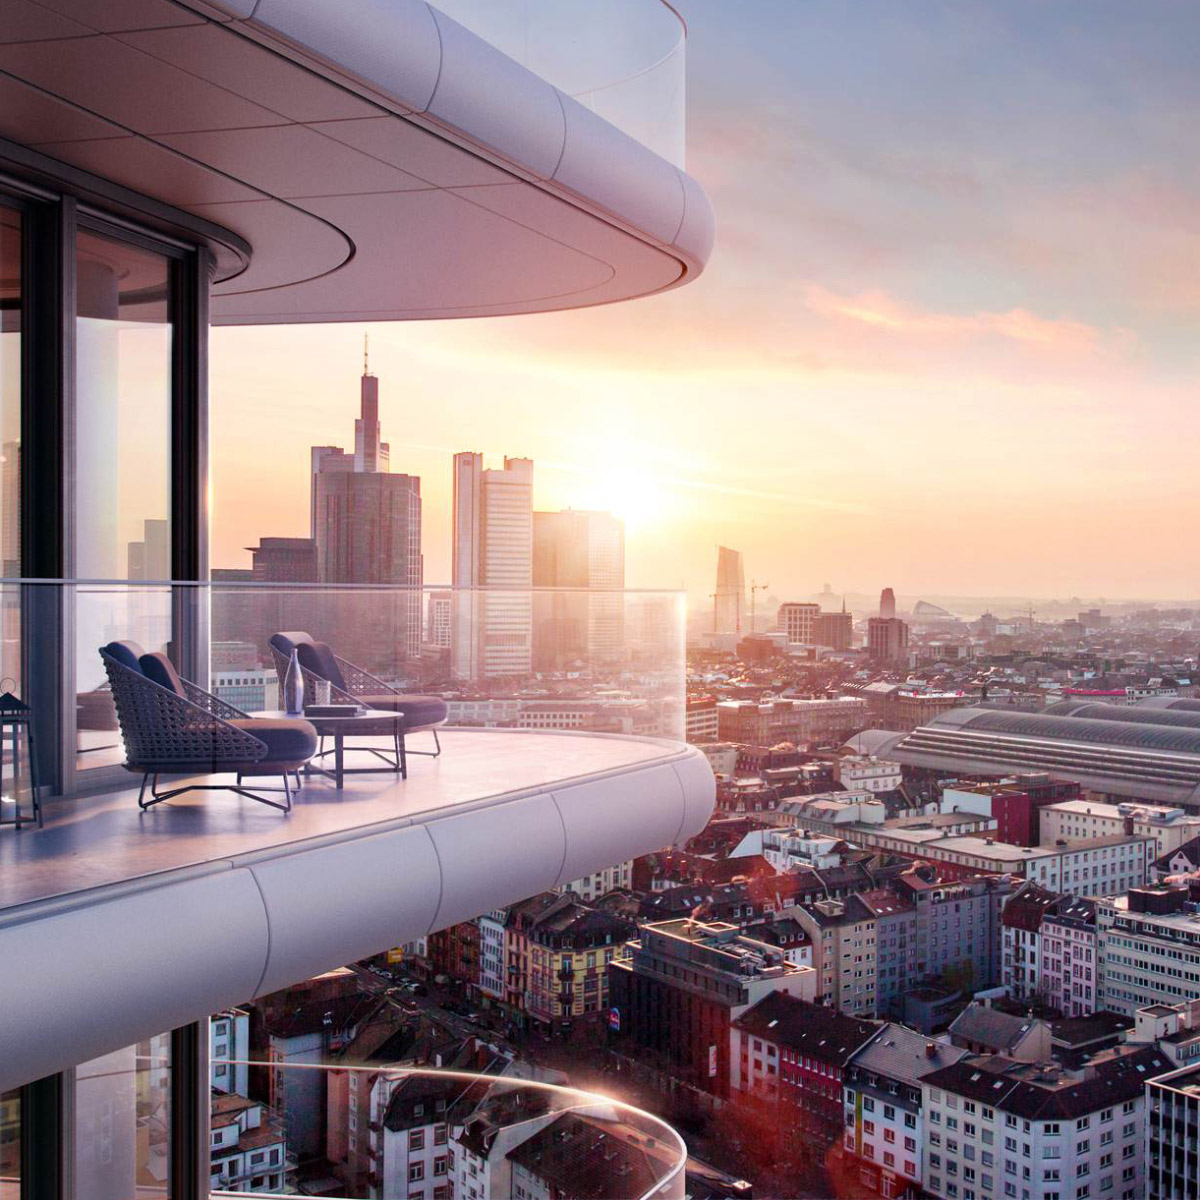 Baufirmen In Frankfurt grand tower gsp städtebau